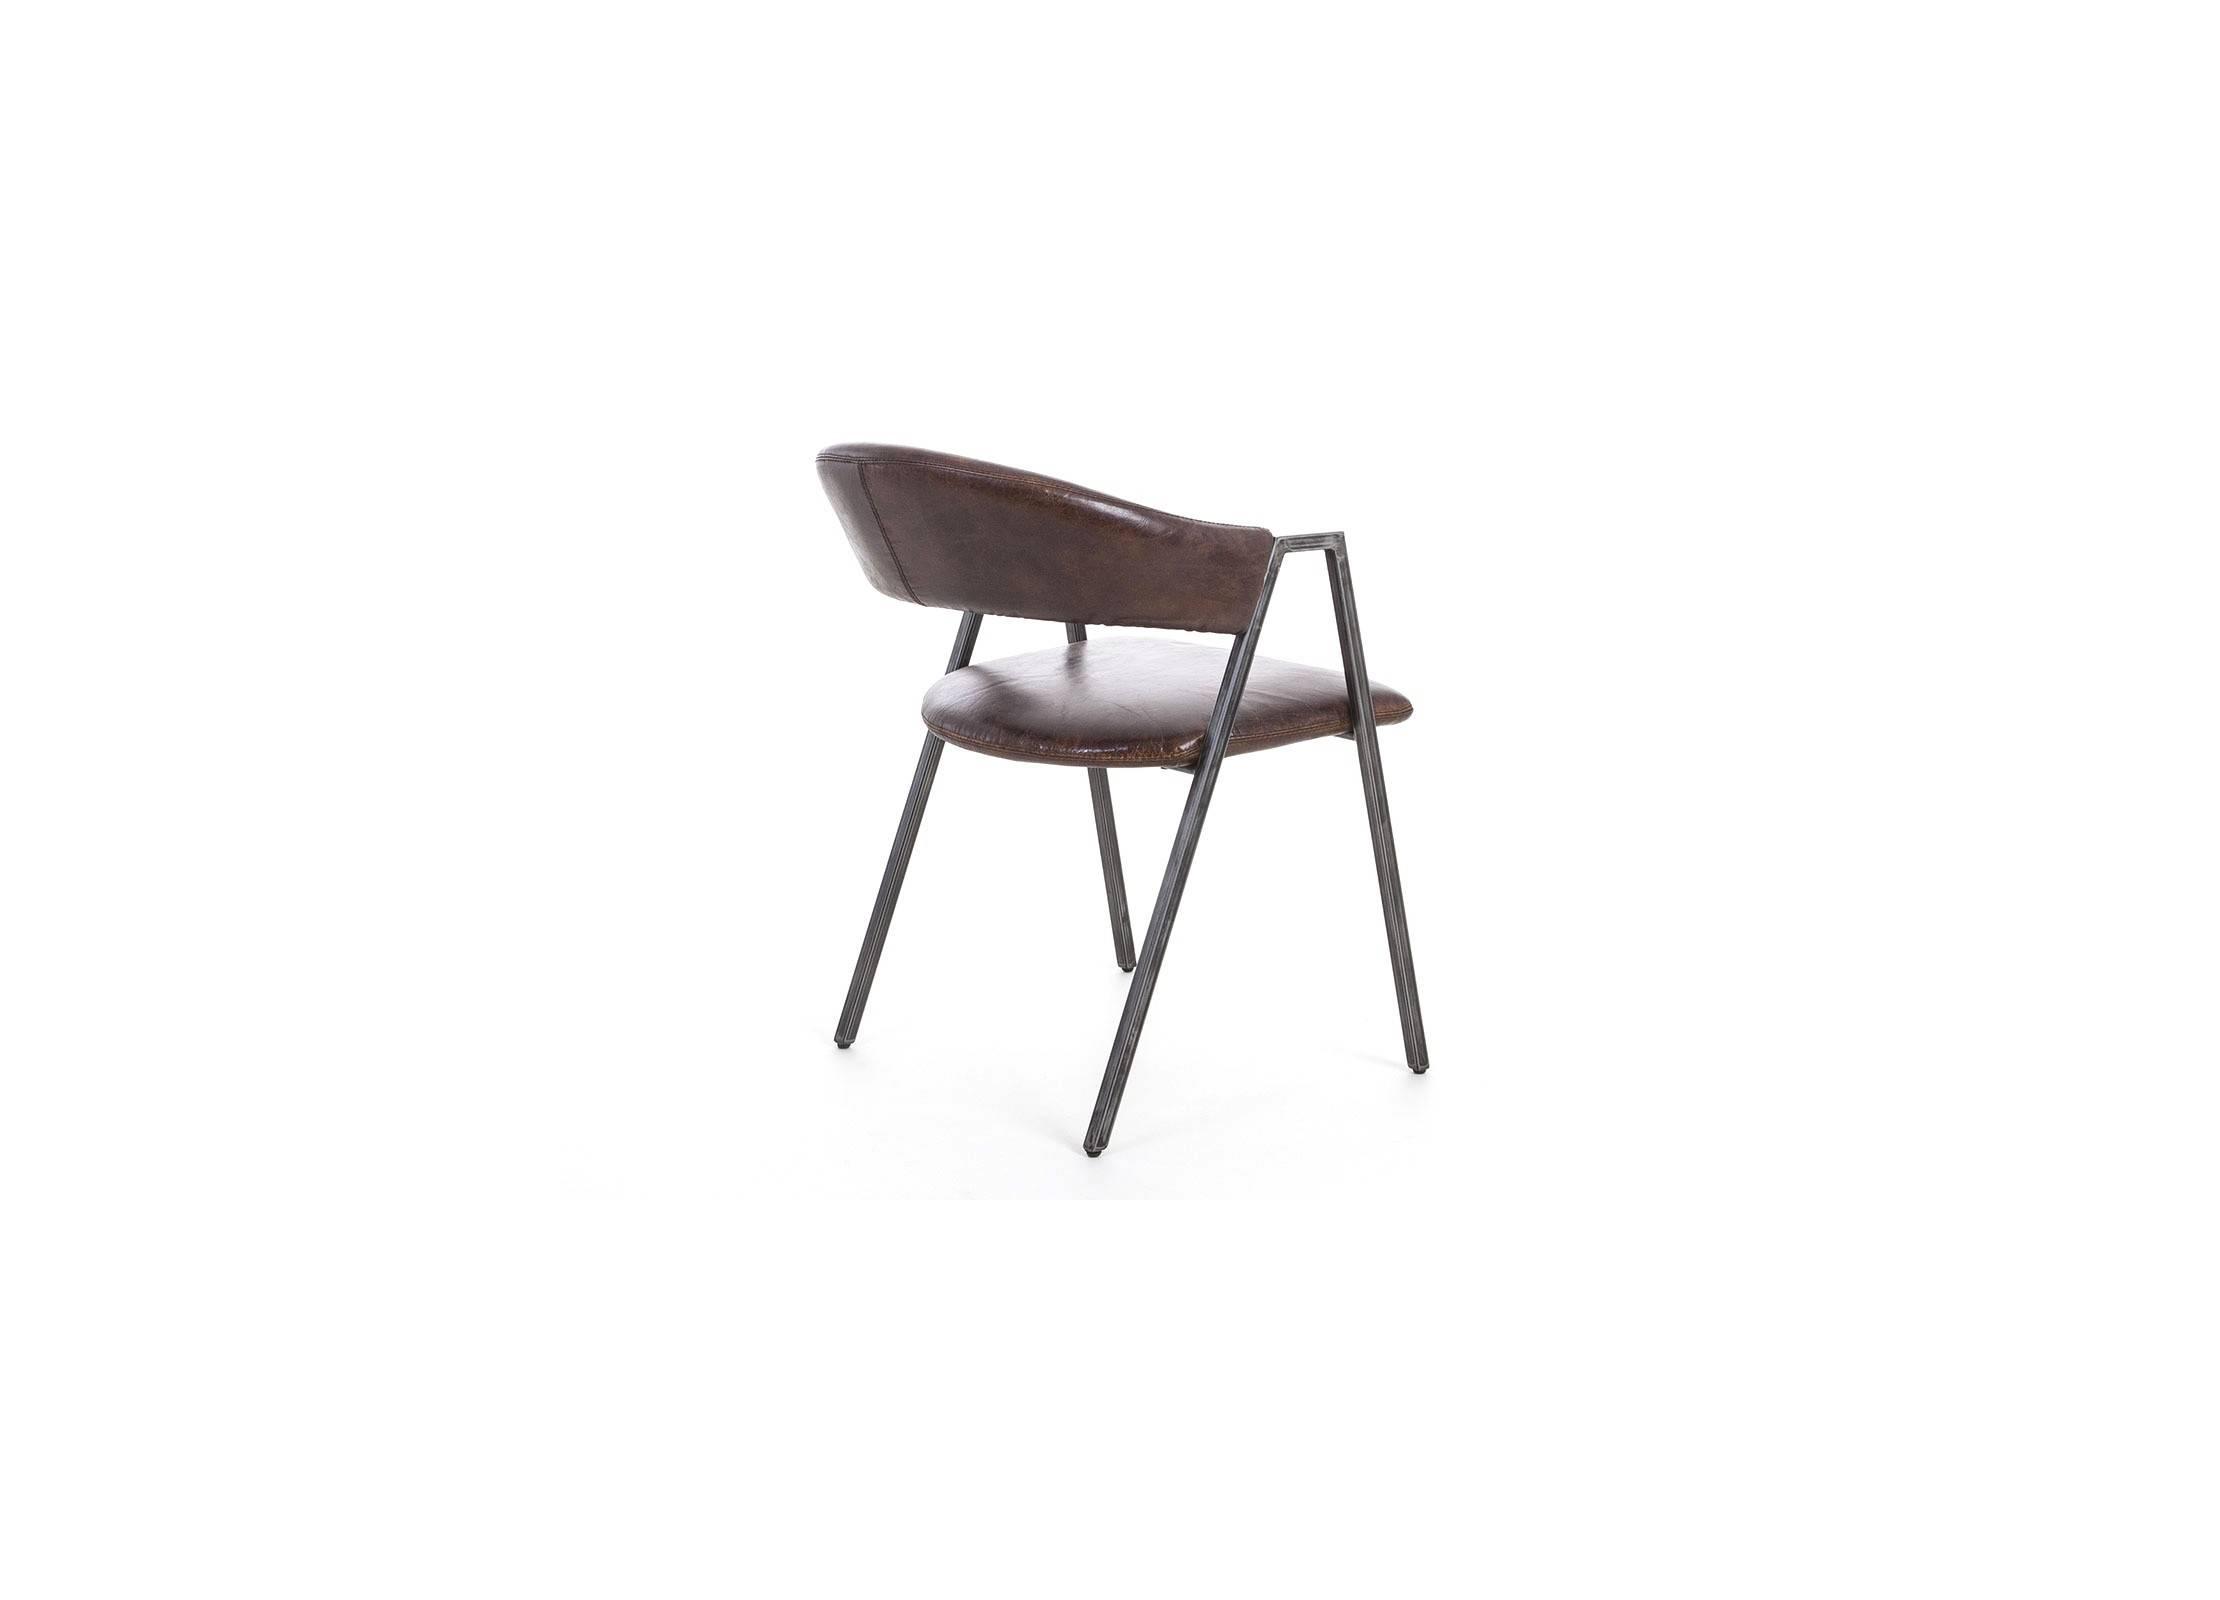 chaise en cuir vintage et metal noir. Black Bedroom Furniture Sets. Home Design Ideas